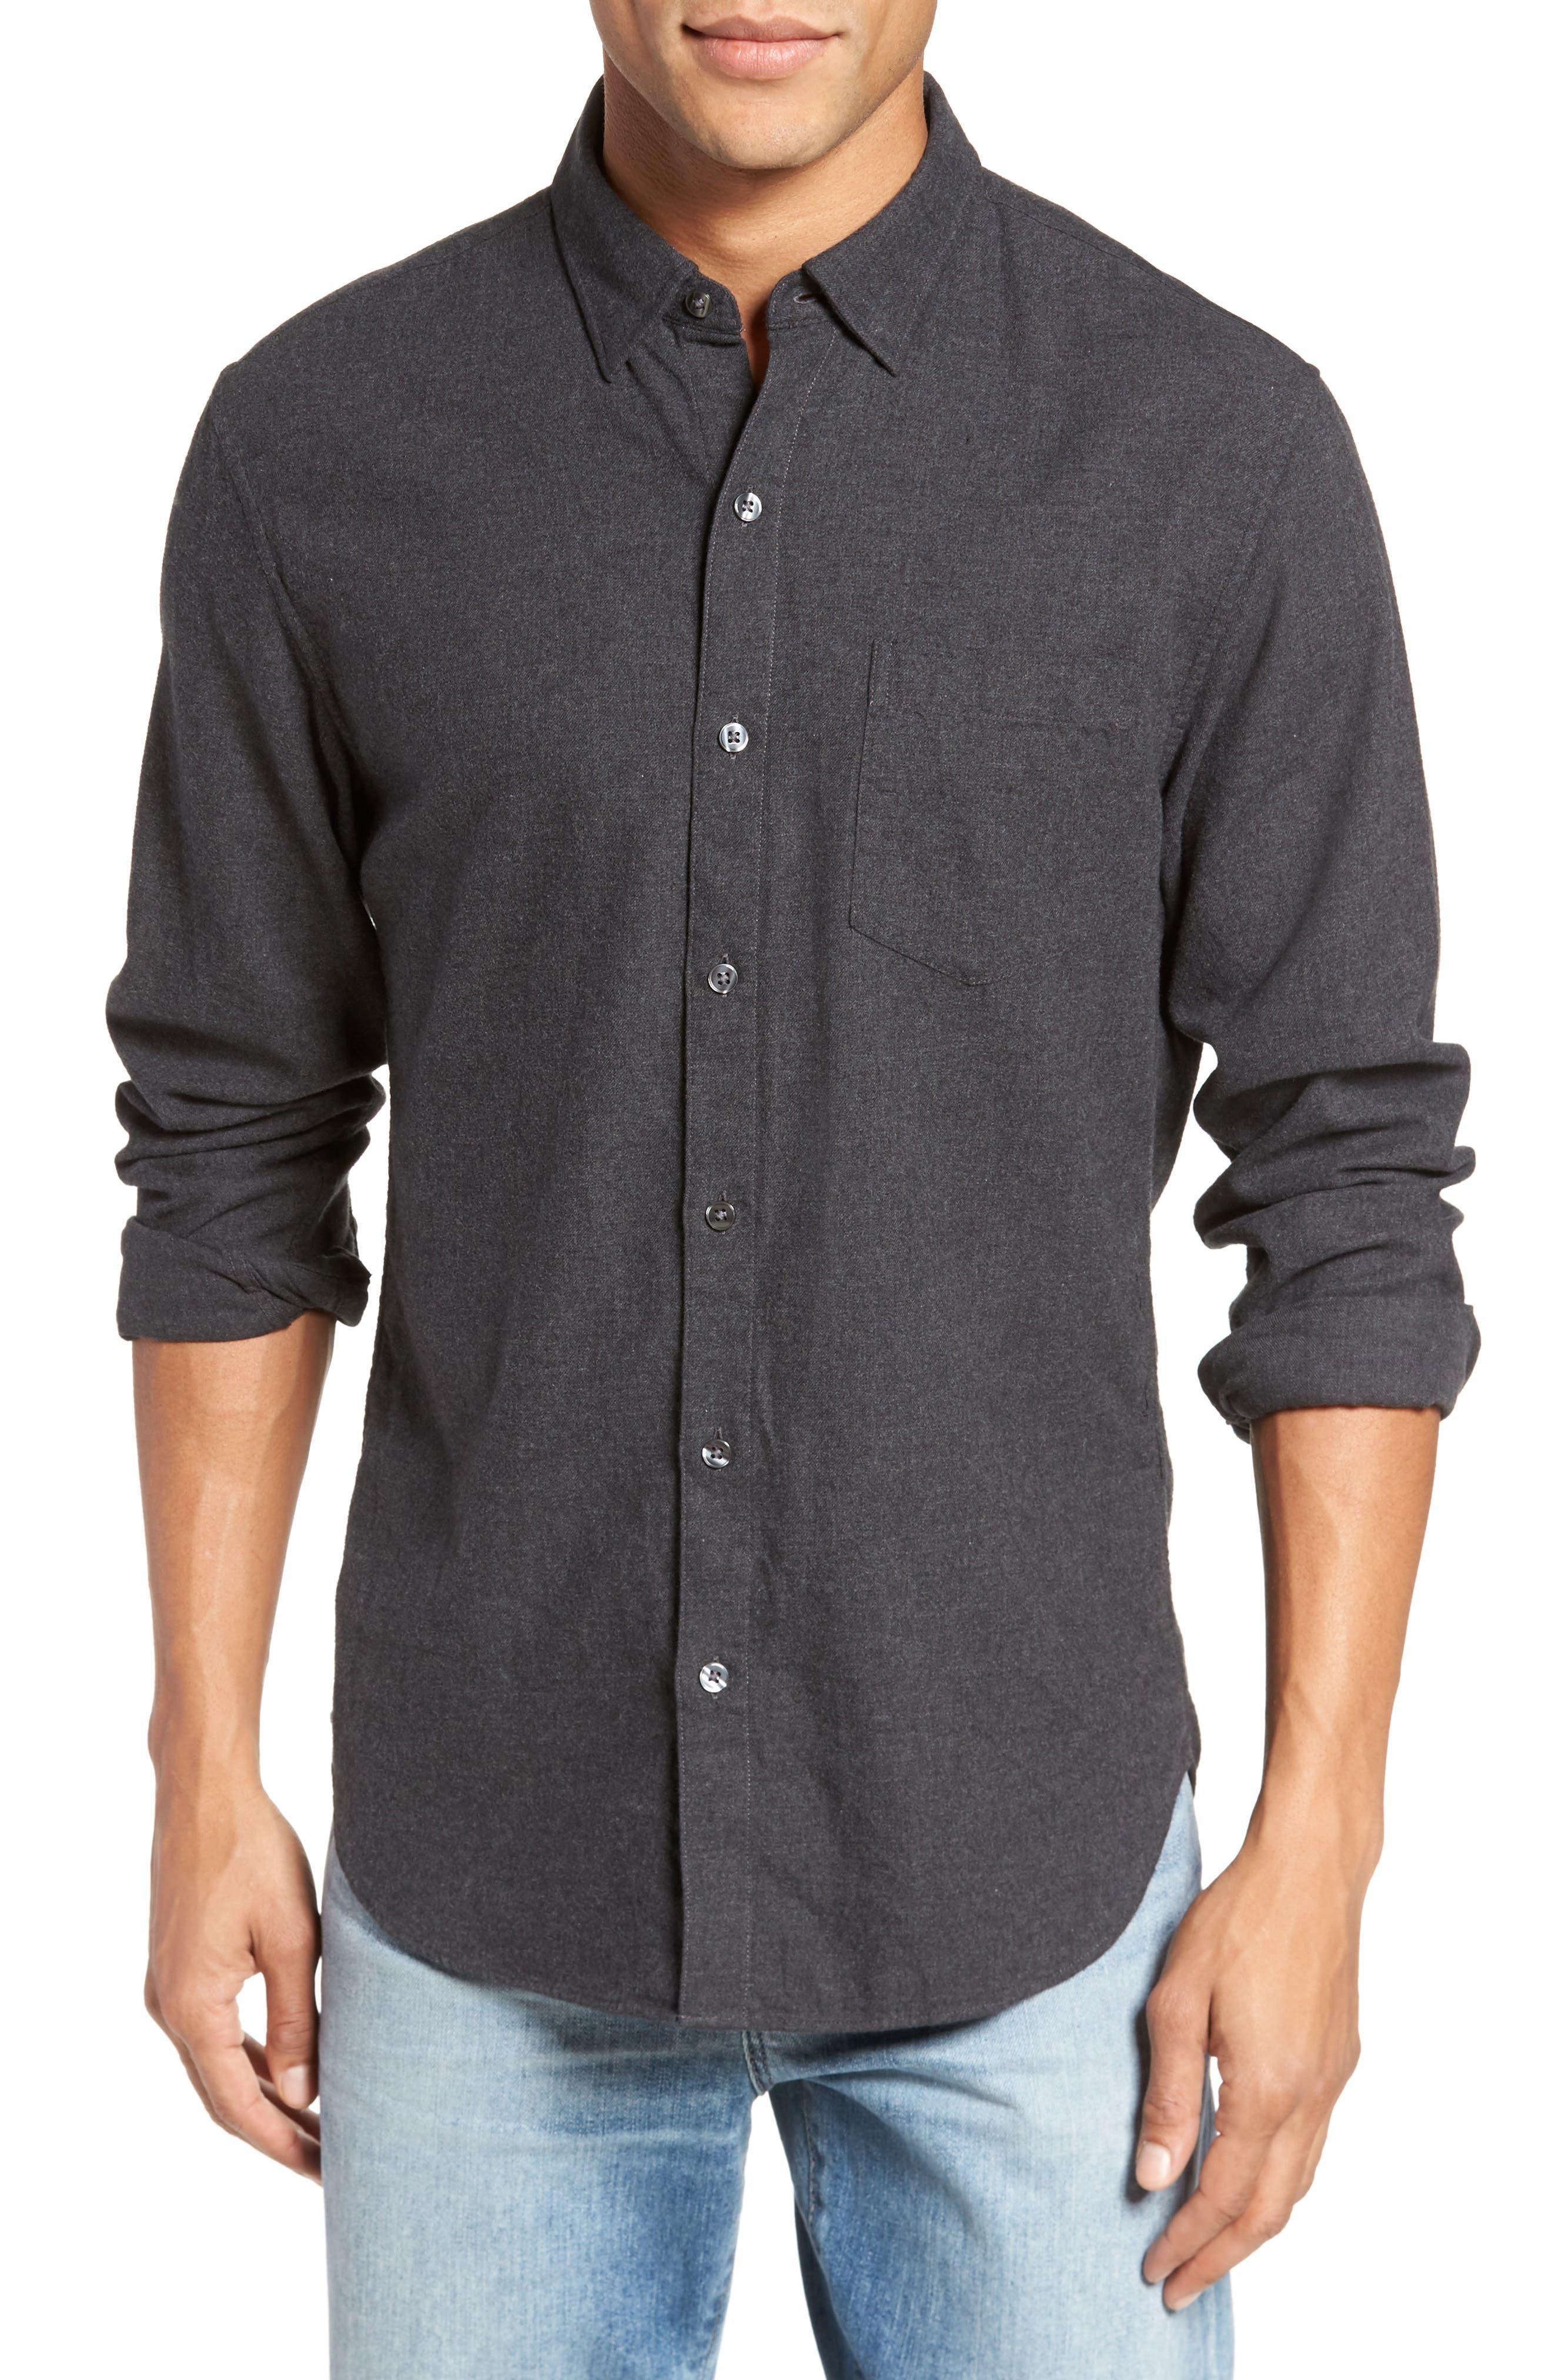 Main Image - Bonobos Slim Fit Brushed Twill Sport Shirt